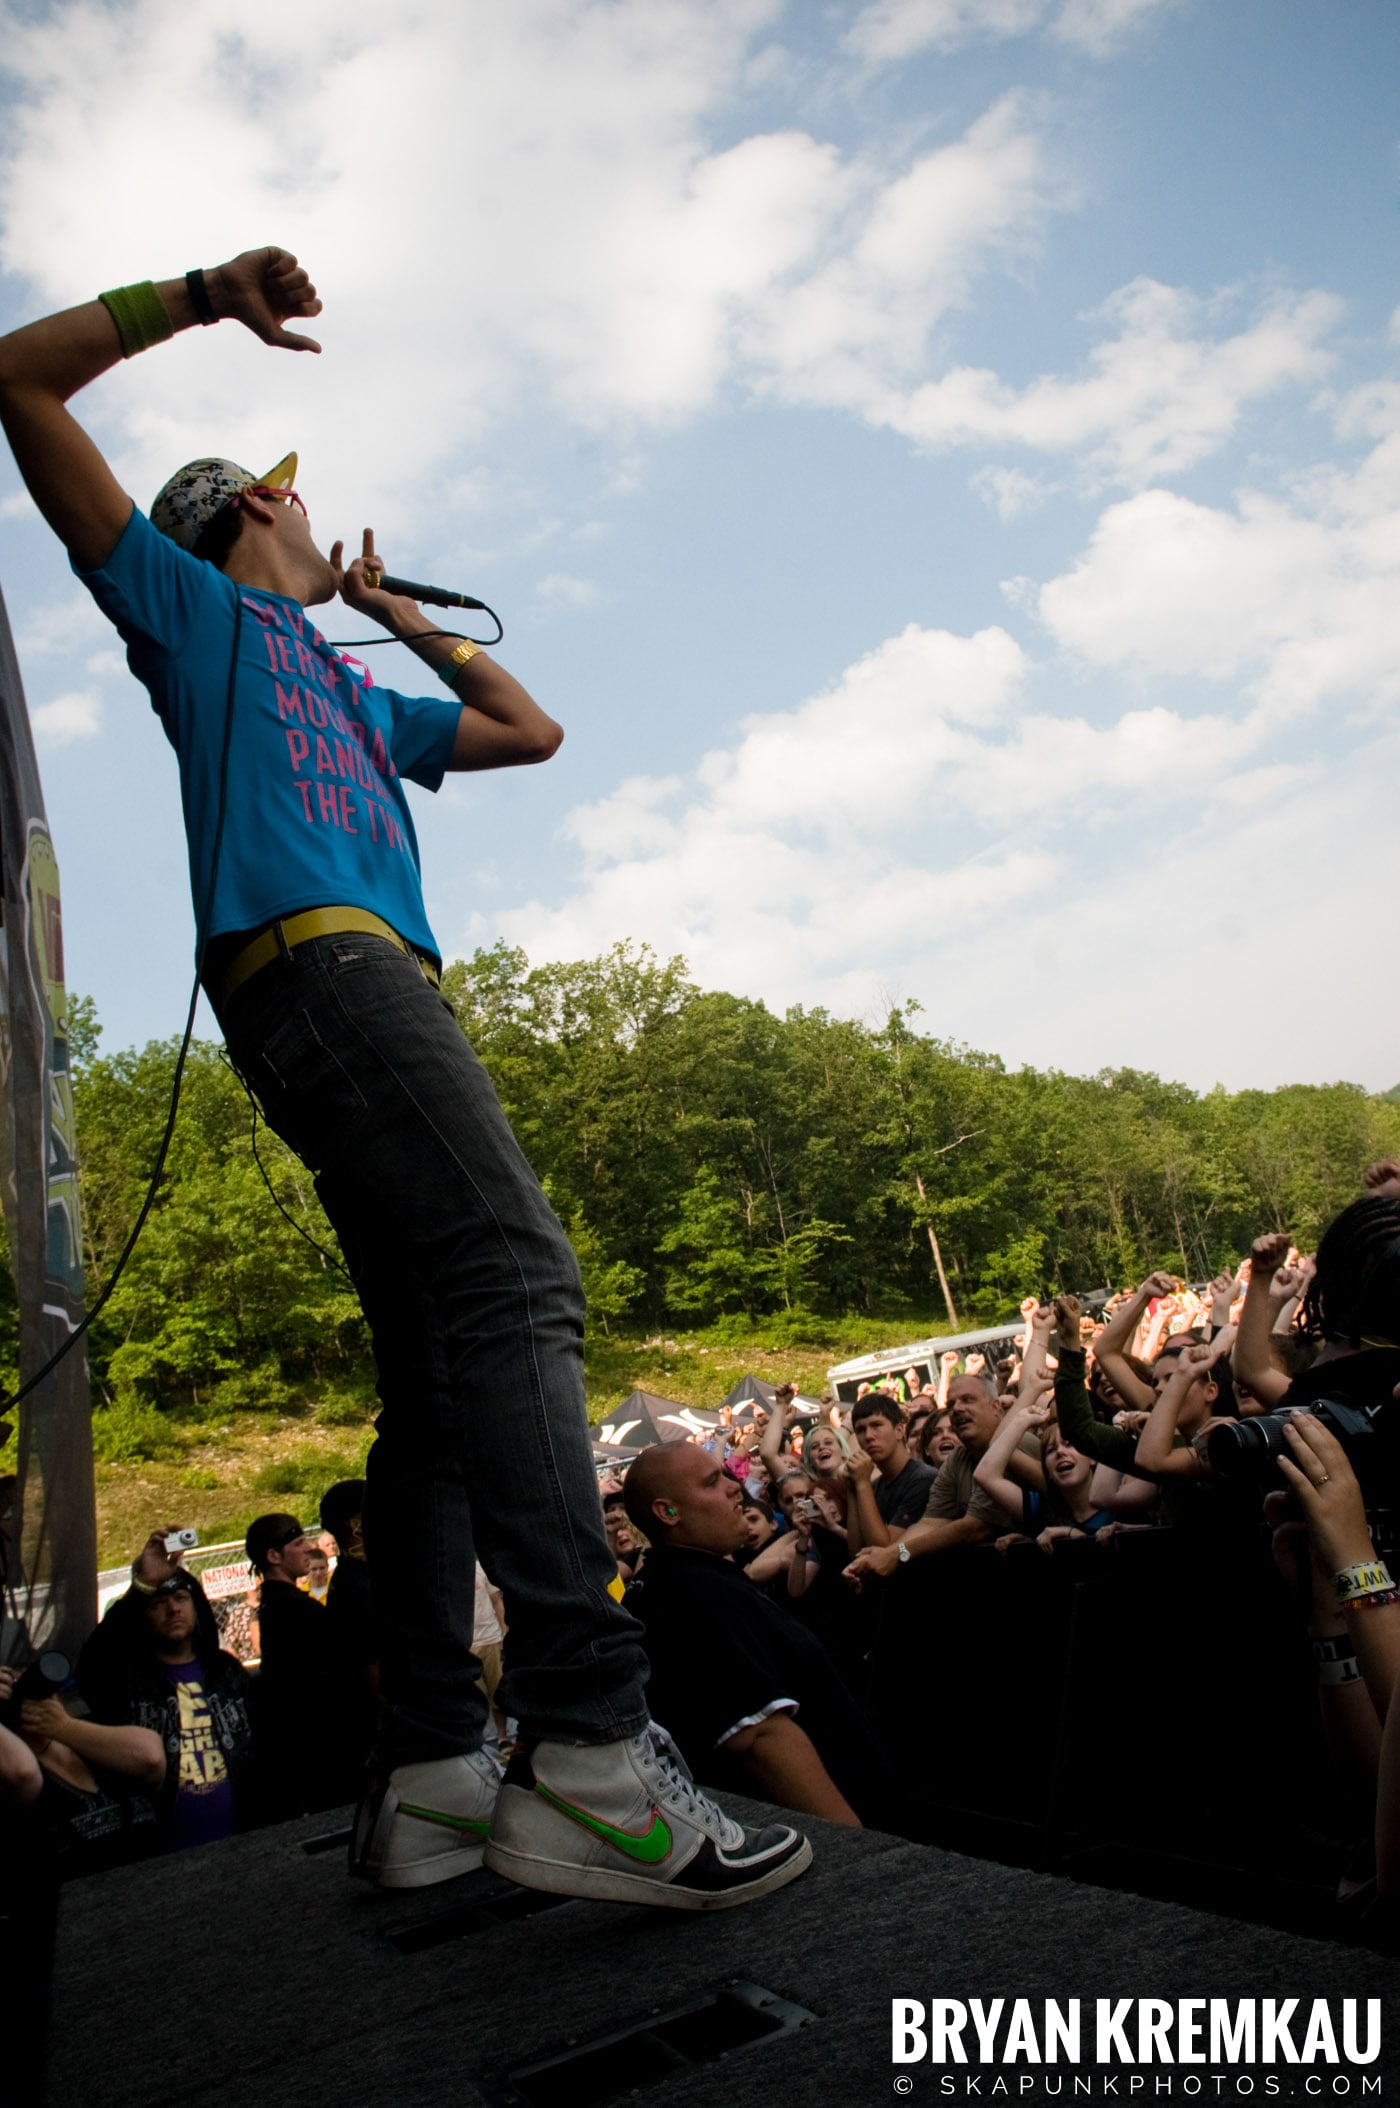 Cobra Starship @ Warped Tour 08, Scranton PA - 7.27.08 (7)